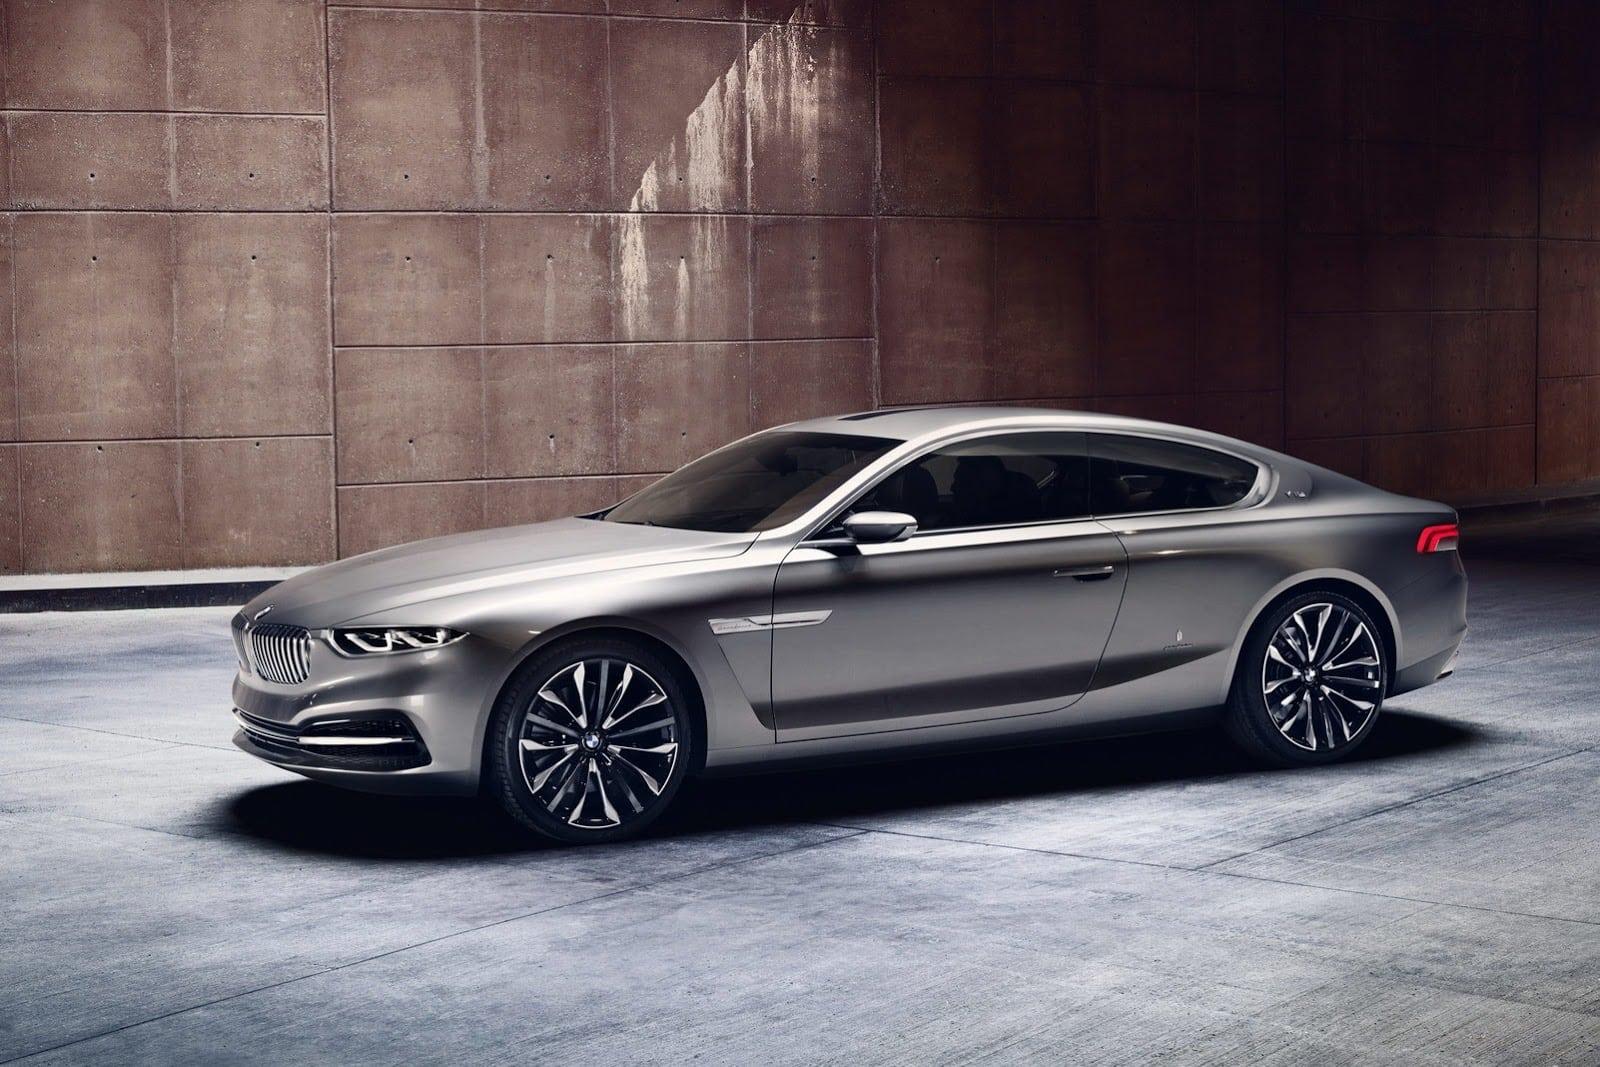 2020 BMW 530e Spy Shots